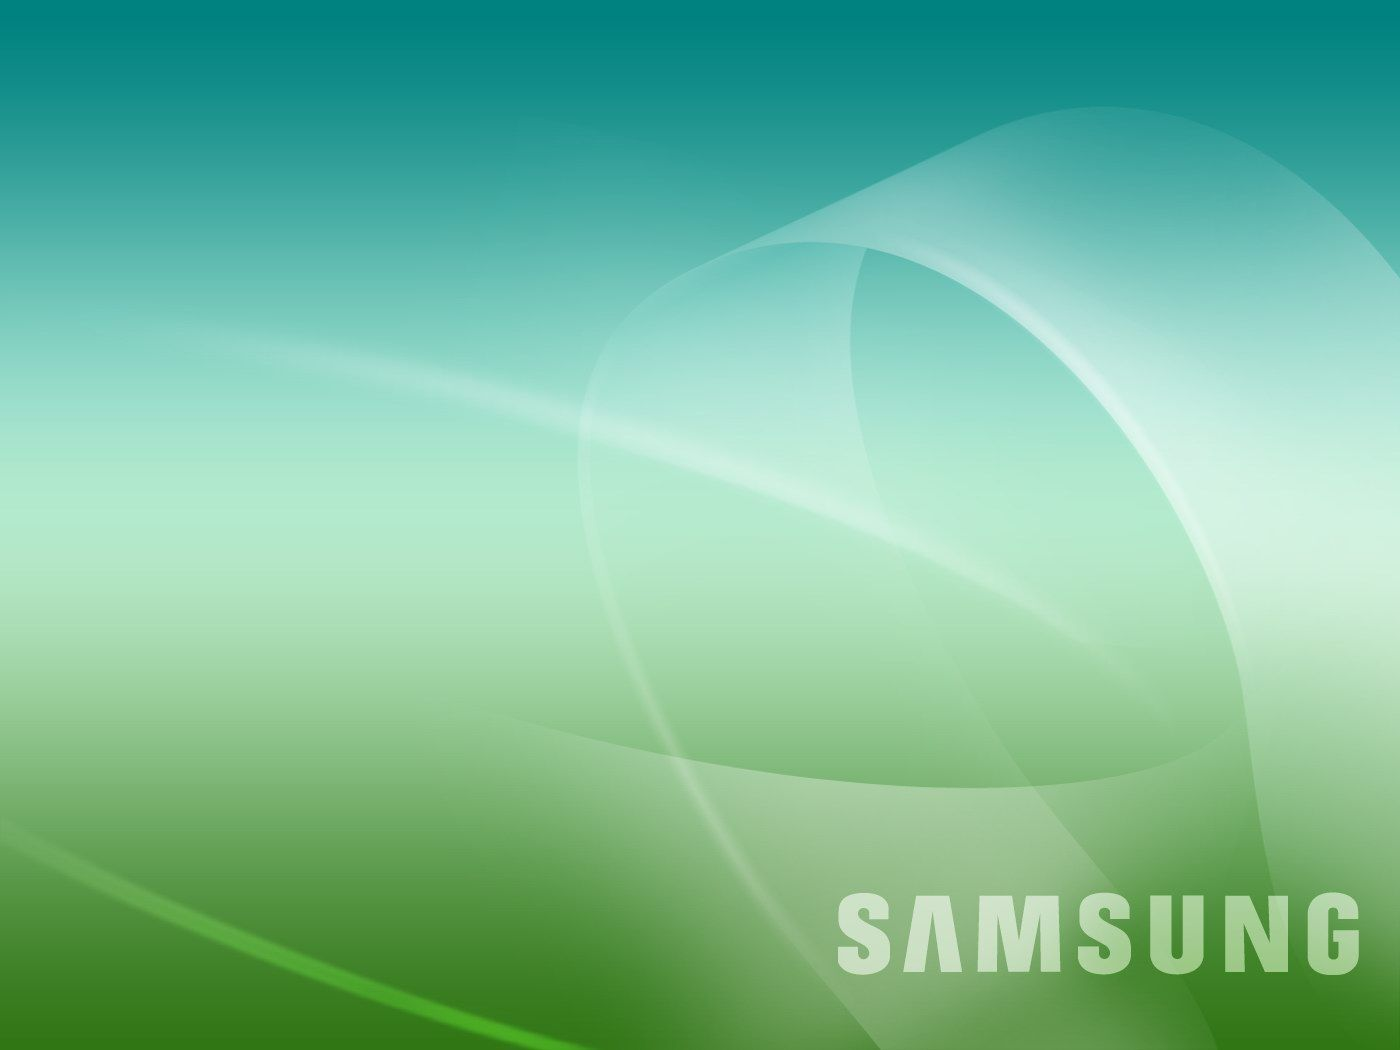 Prabhas Wallpapers Free Download Mobile: Samsung Mobile Wallpapers Free Mobile Wallpapers Free